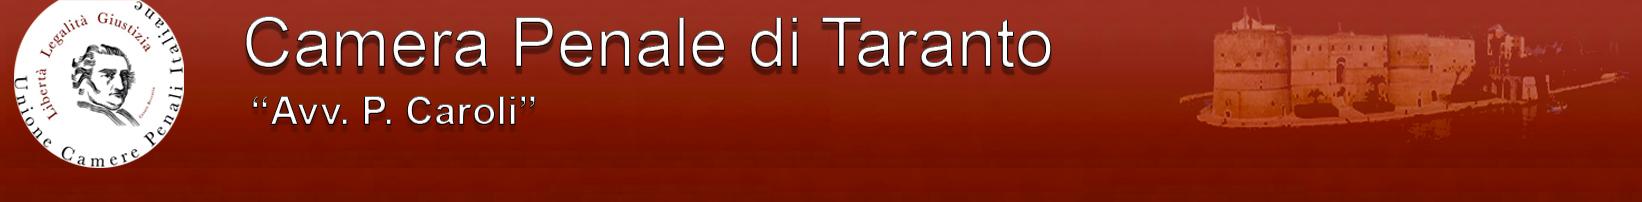 Camera Penale Taranto